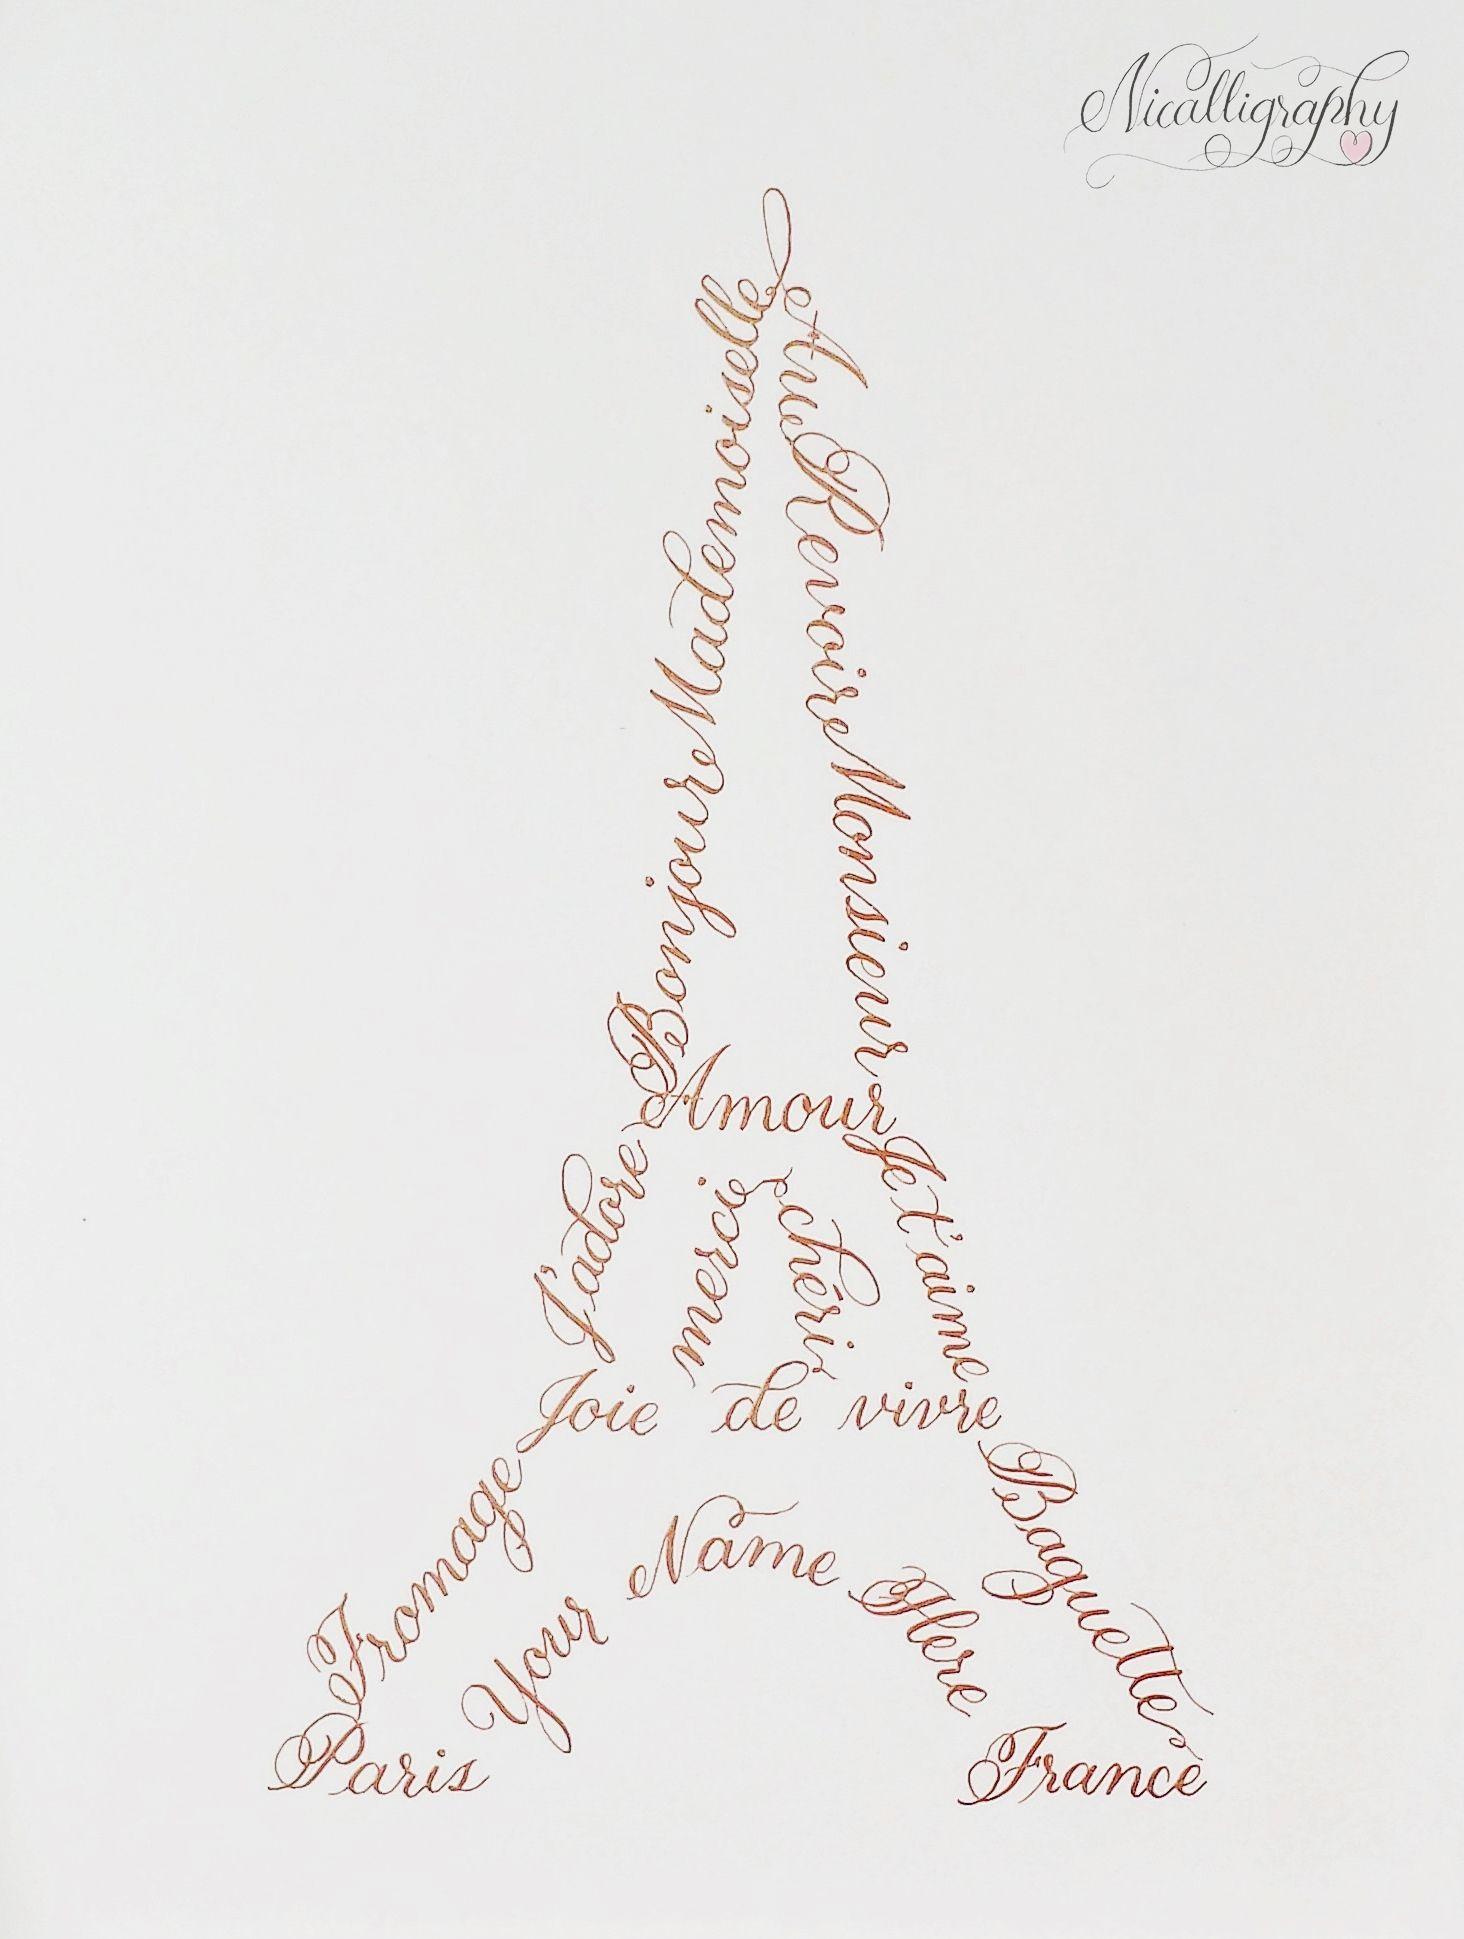 Eiffel Tower calligraphy art design. #paris #france #eiffeltower #art #design #calligraphy #moderncalligraphy